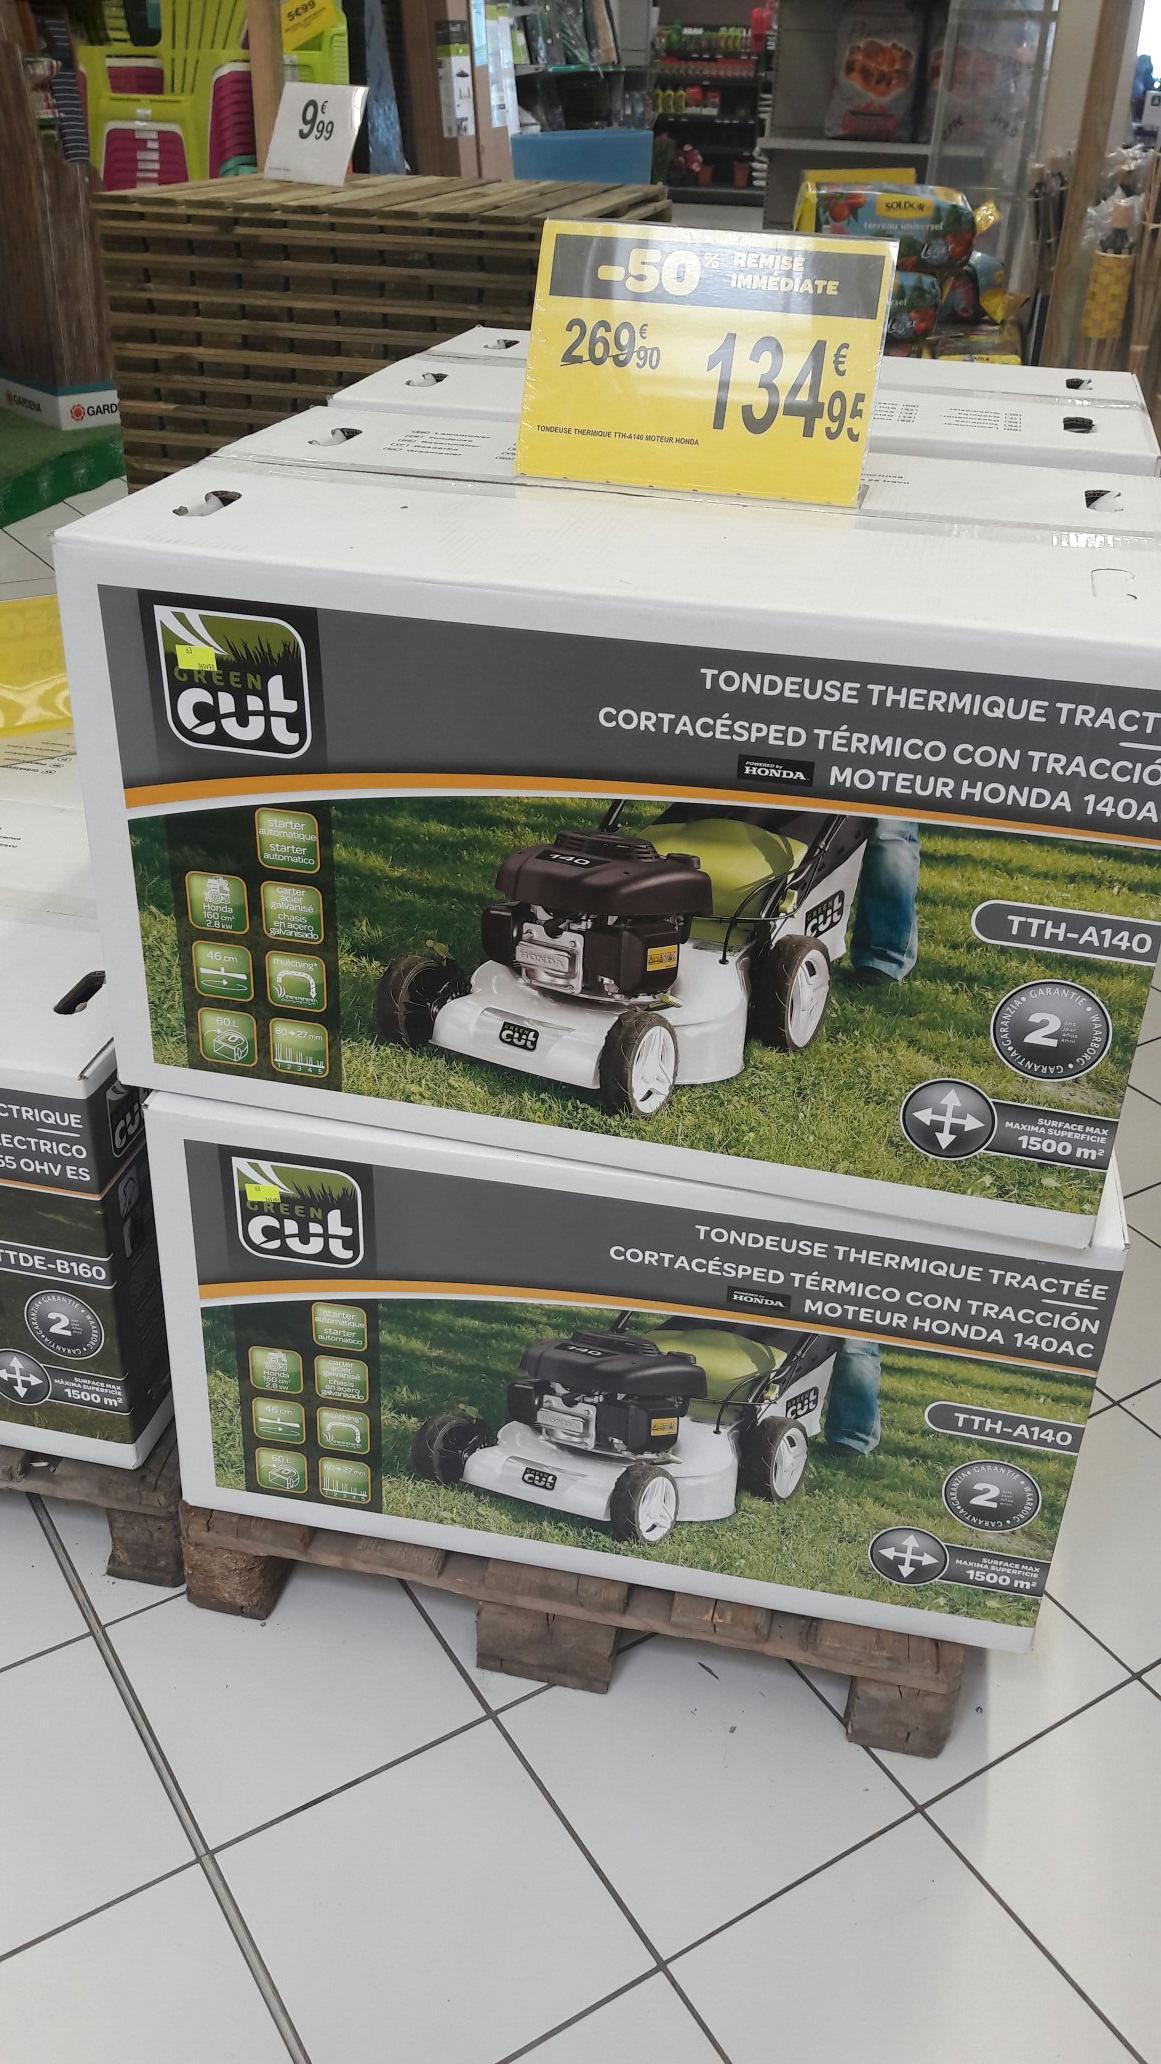 tondeuse thermique tract e green cut tth a140 moteur honda. Black Bedroom Furniture Sets. Home Design Ideas